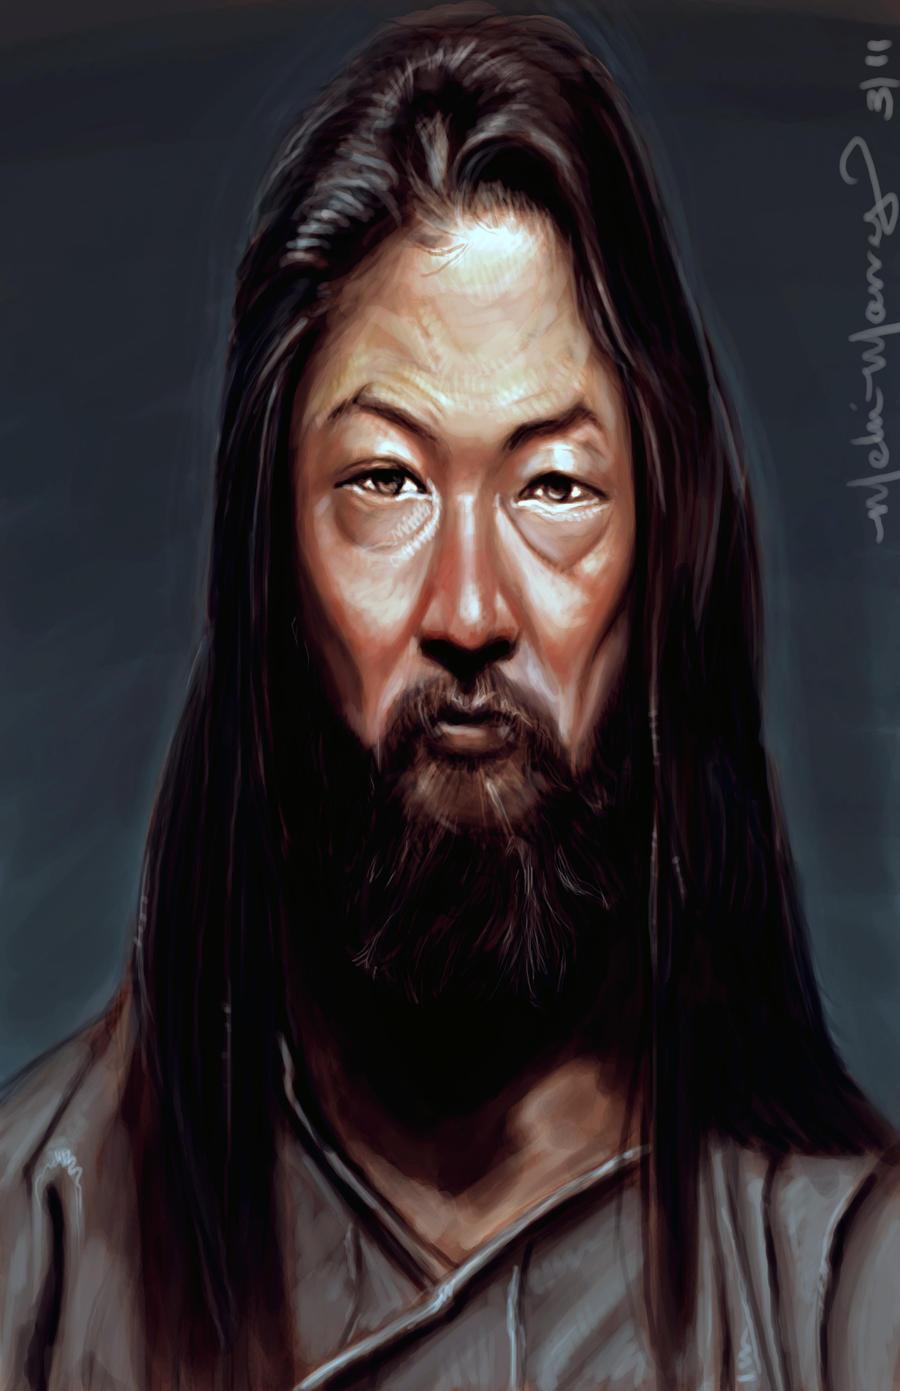 temujin genghis khan 2 by mellomarrero on deviantart